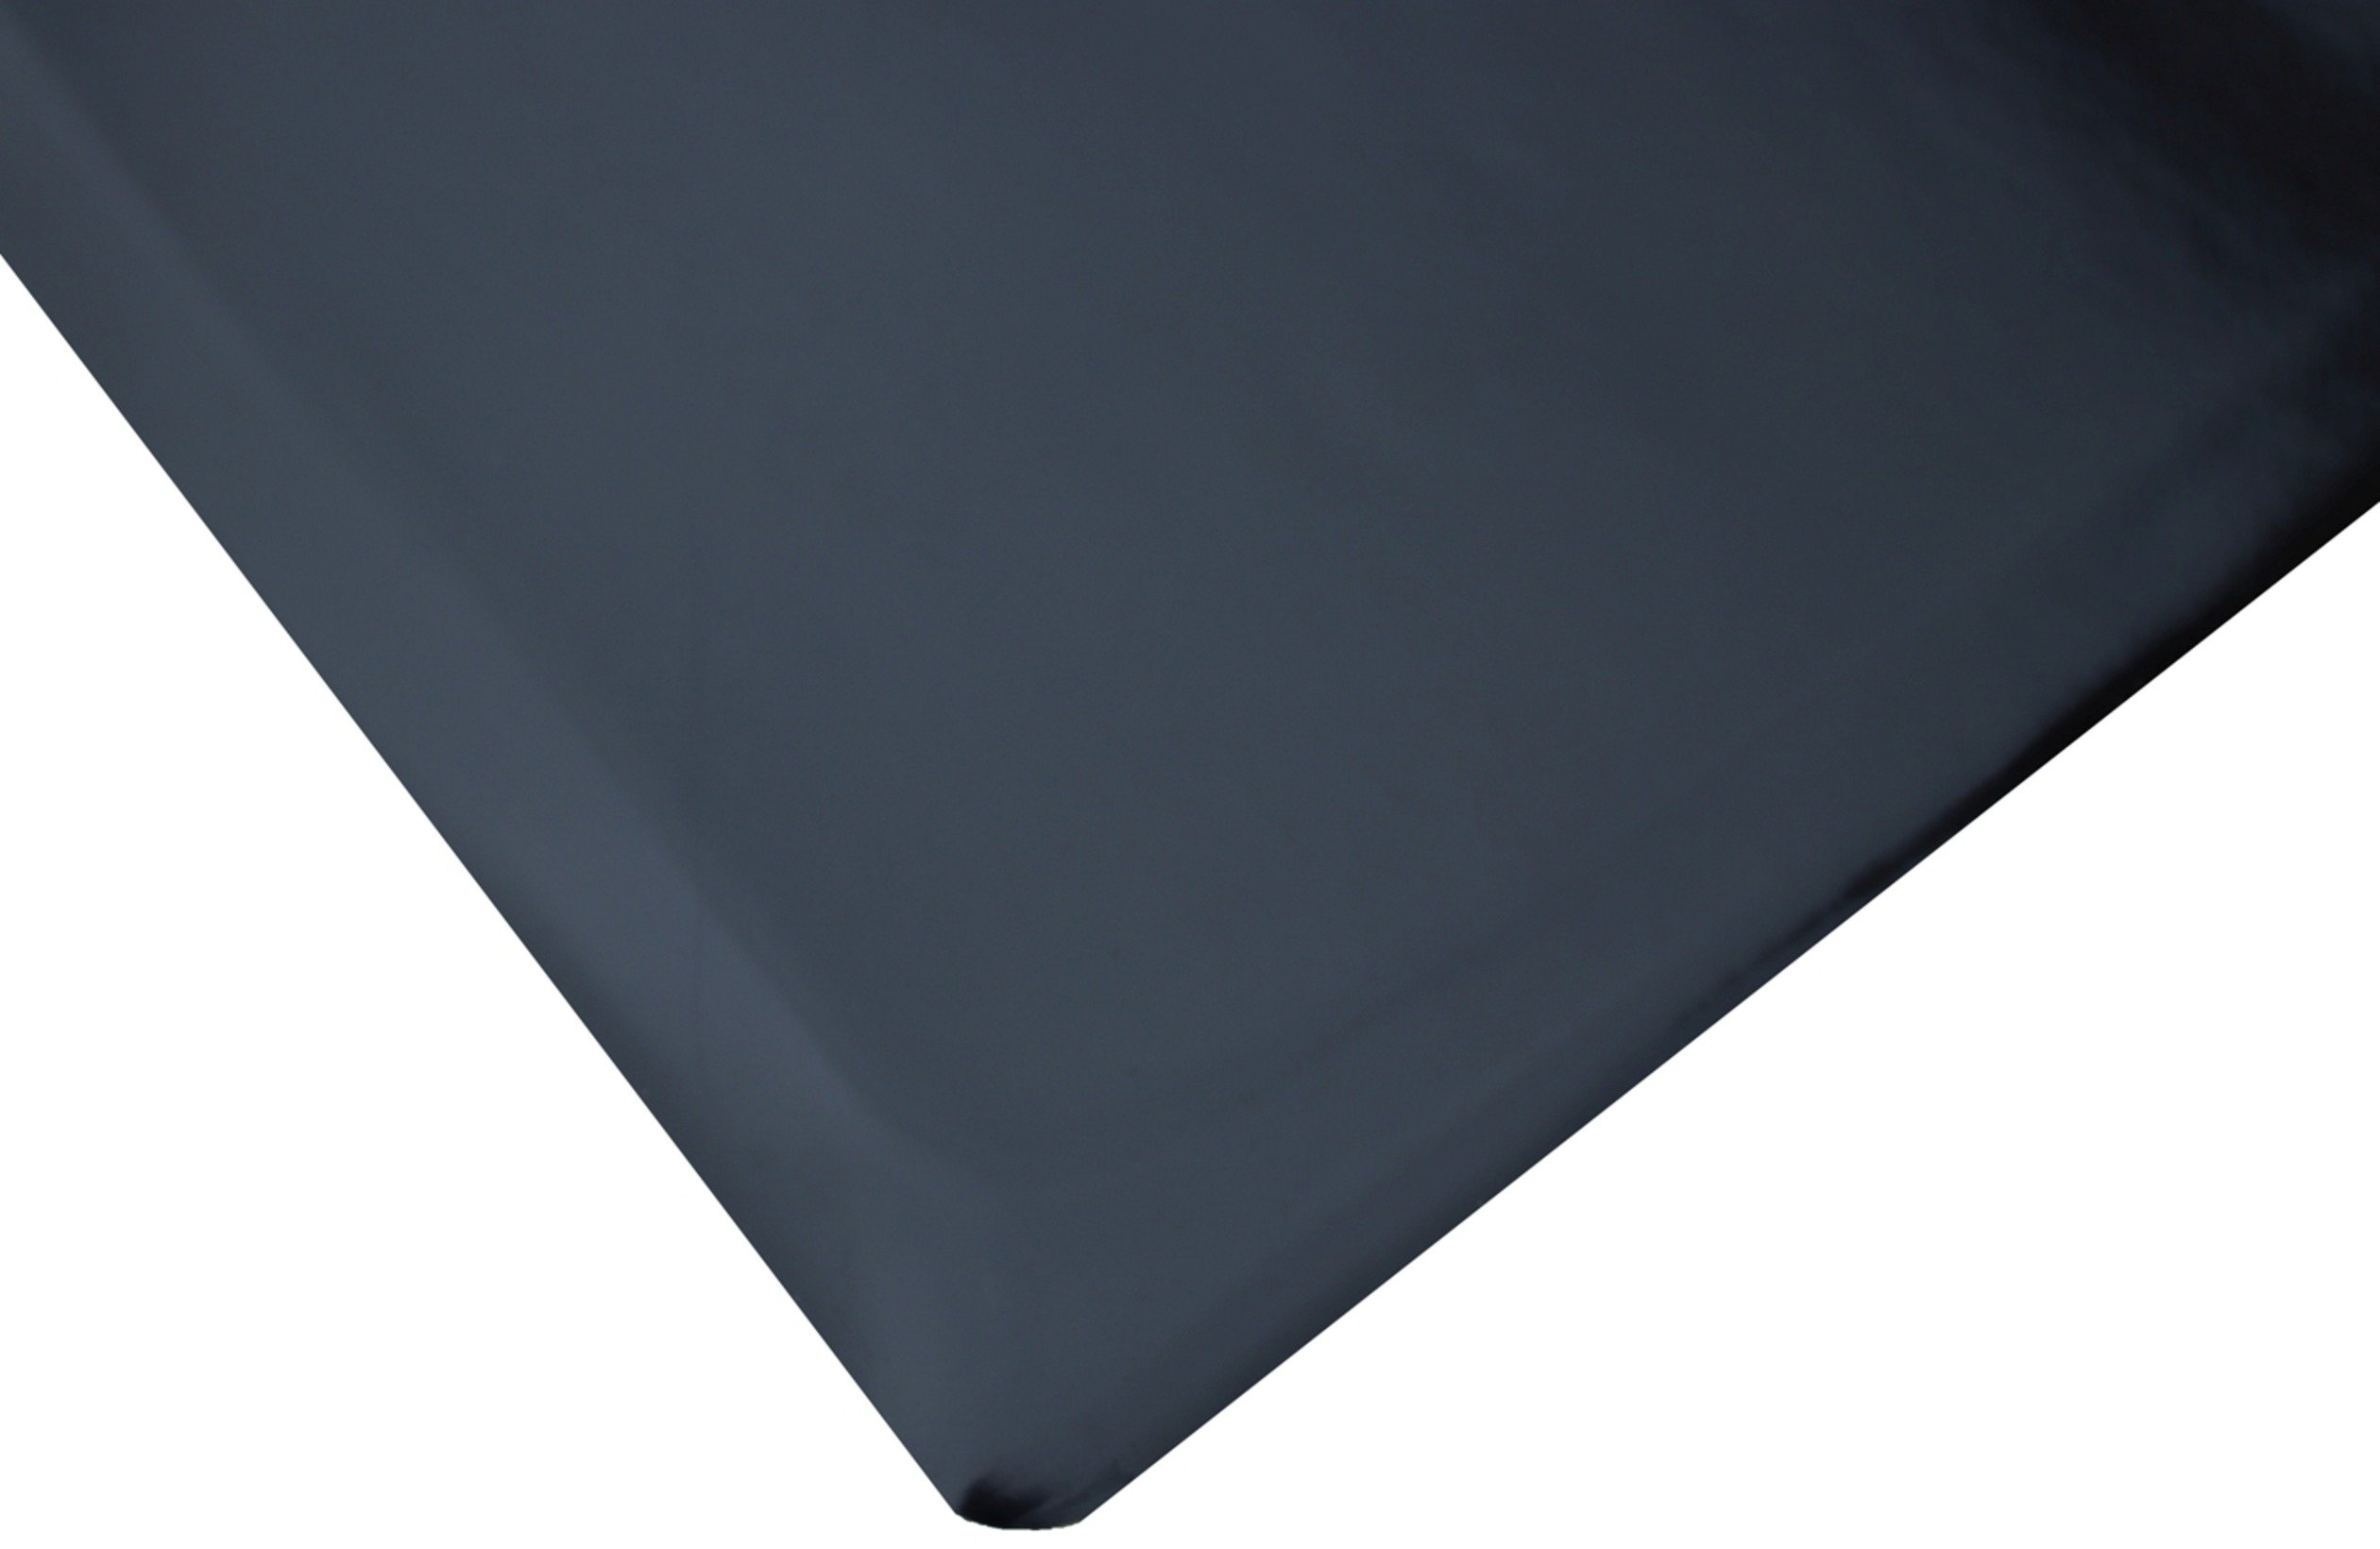 Rhino Mats TT-R36DSBLKX6 Anti-Fatigue Mat, Marbleized Tile Top, Vinyl, 3' x 6' x 7/8'', Black